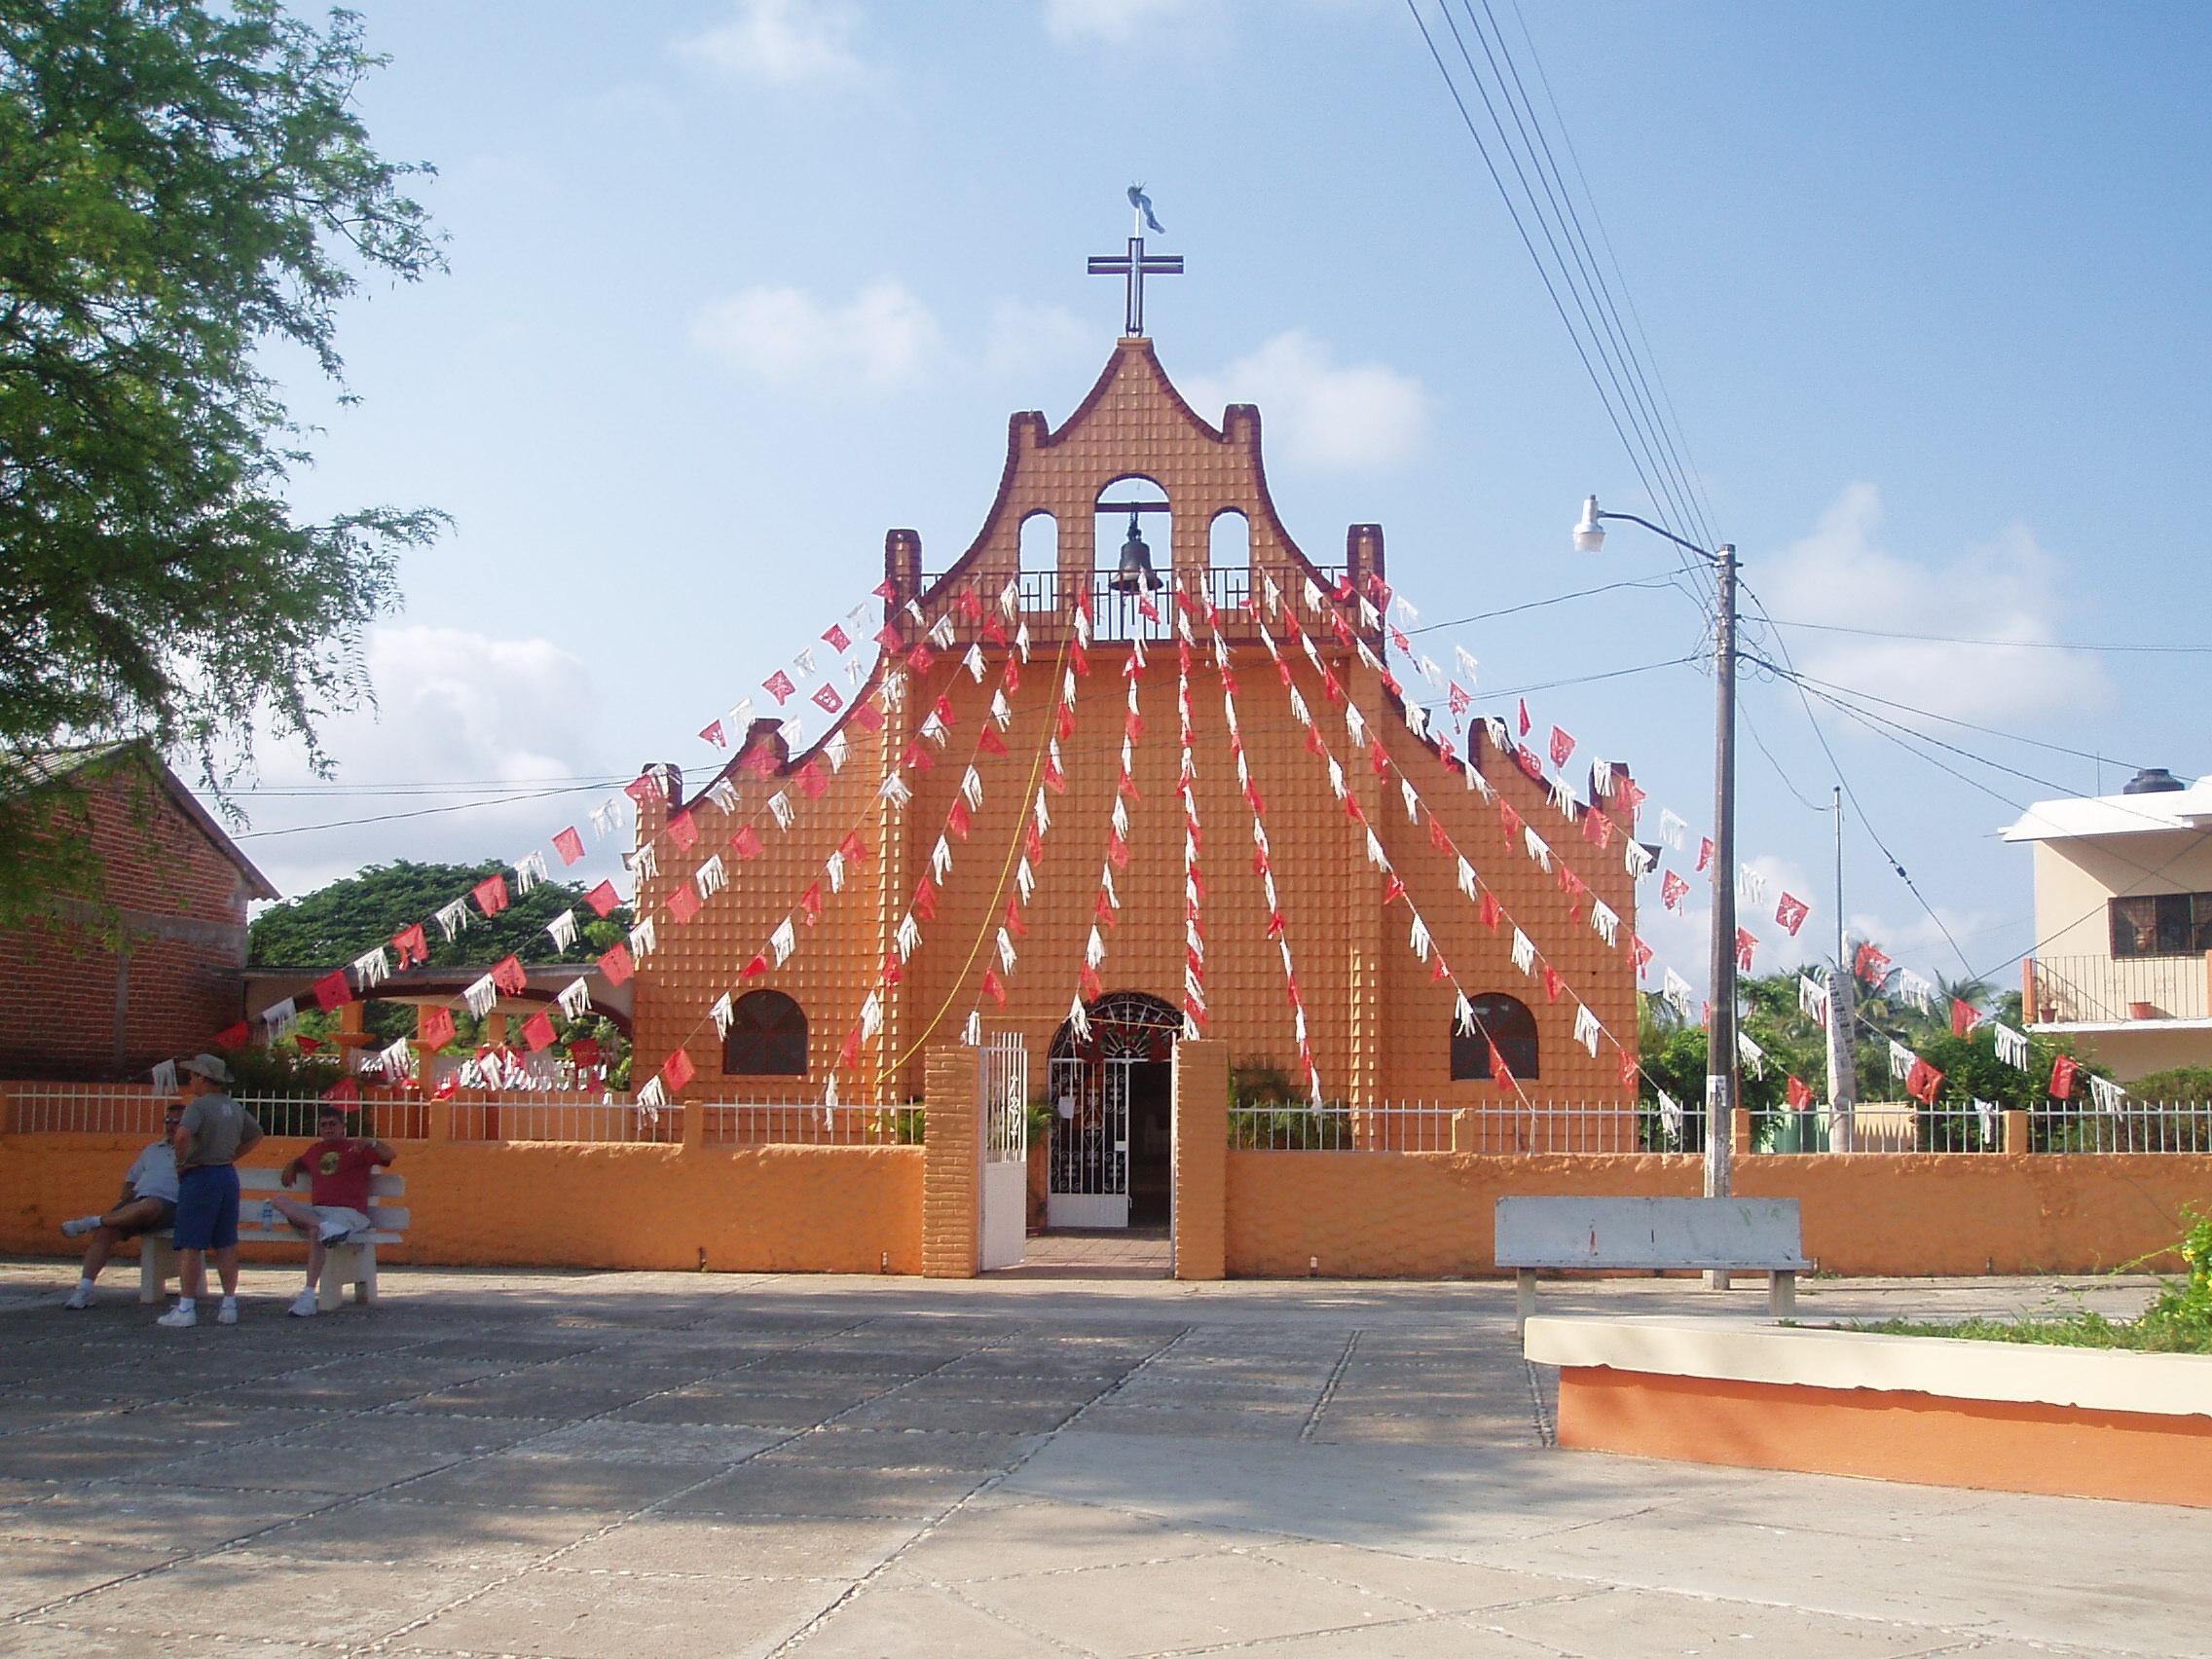 File:Mexican church.JPG - Wikimedia Commons